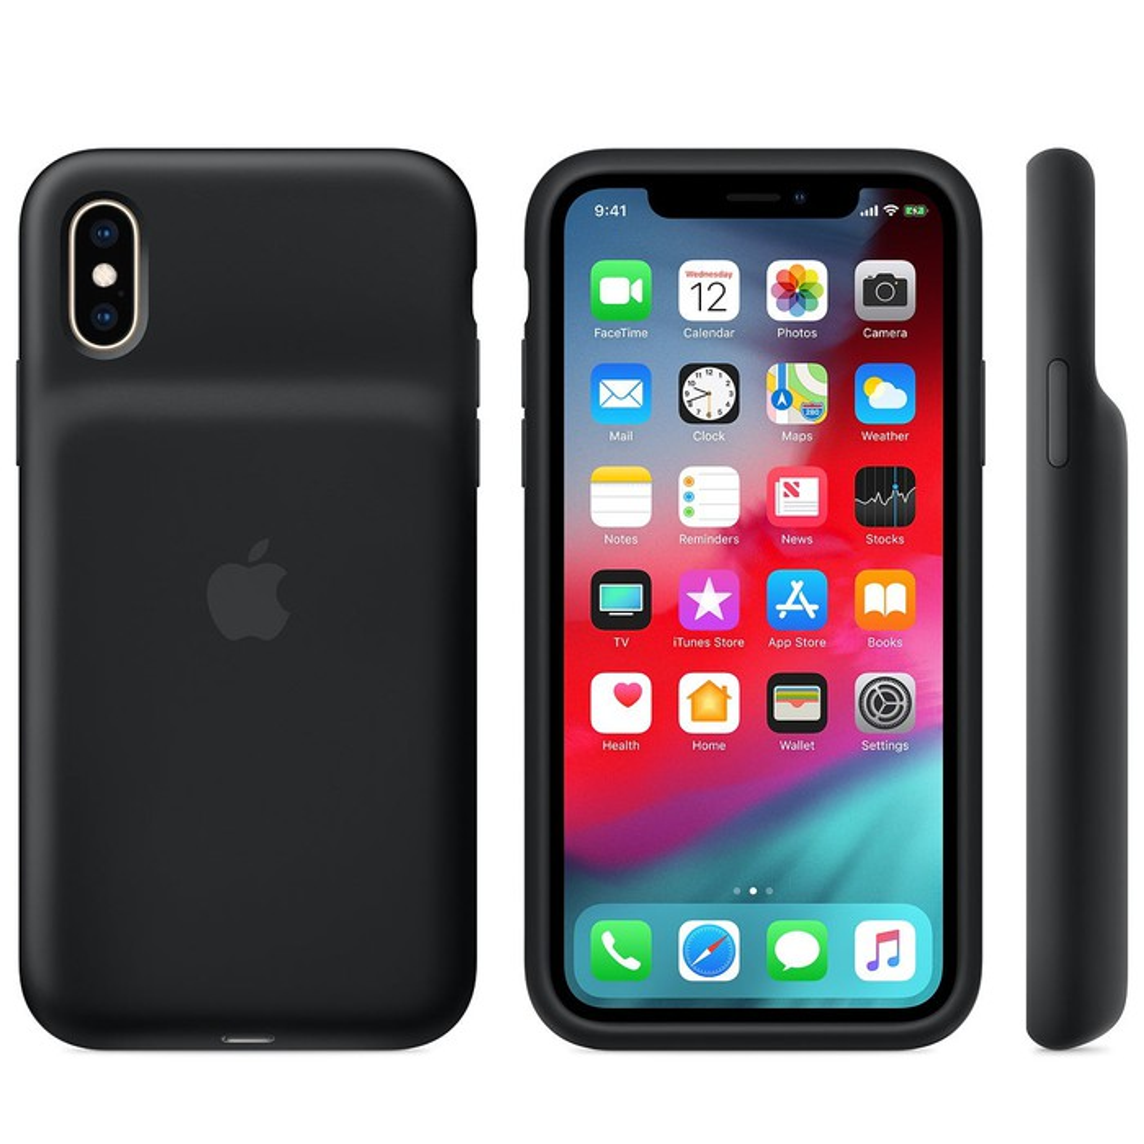 Apple's battery case